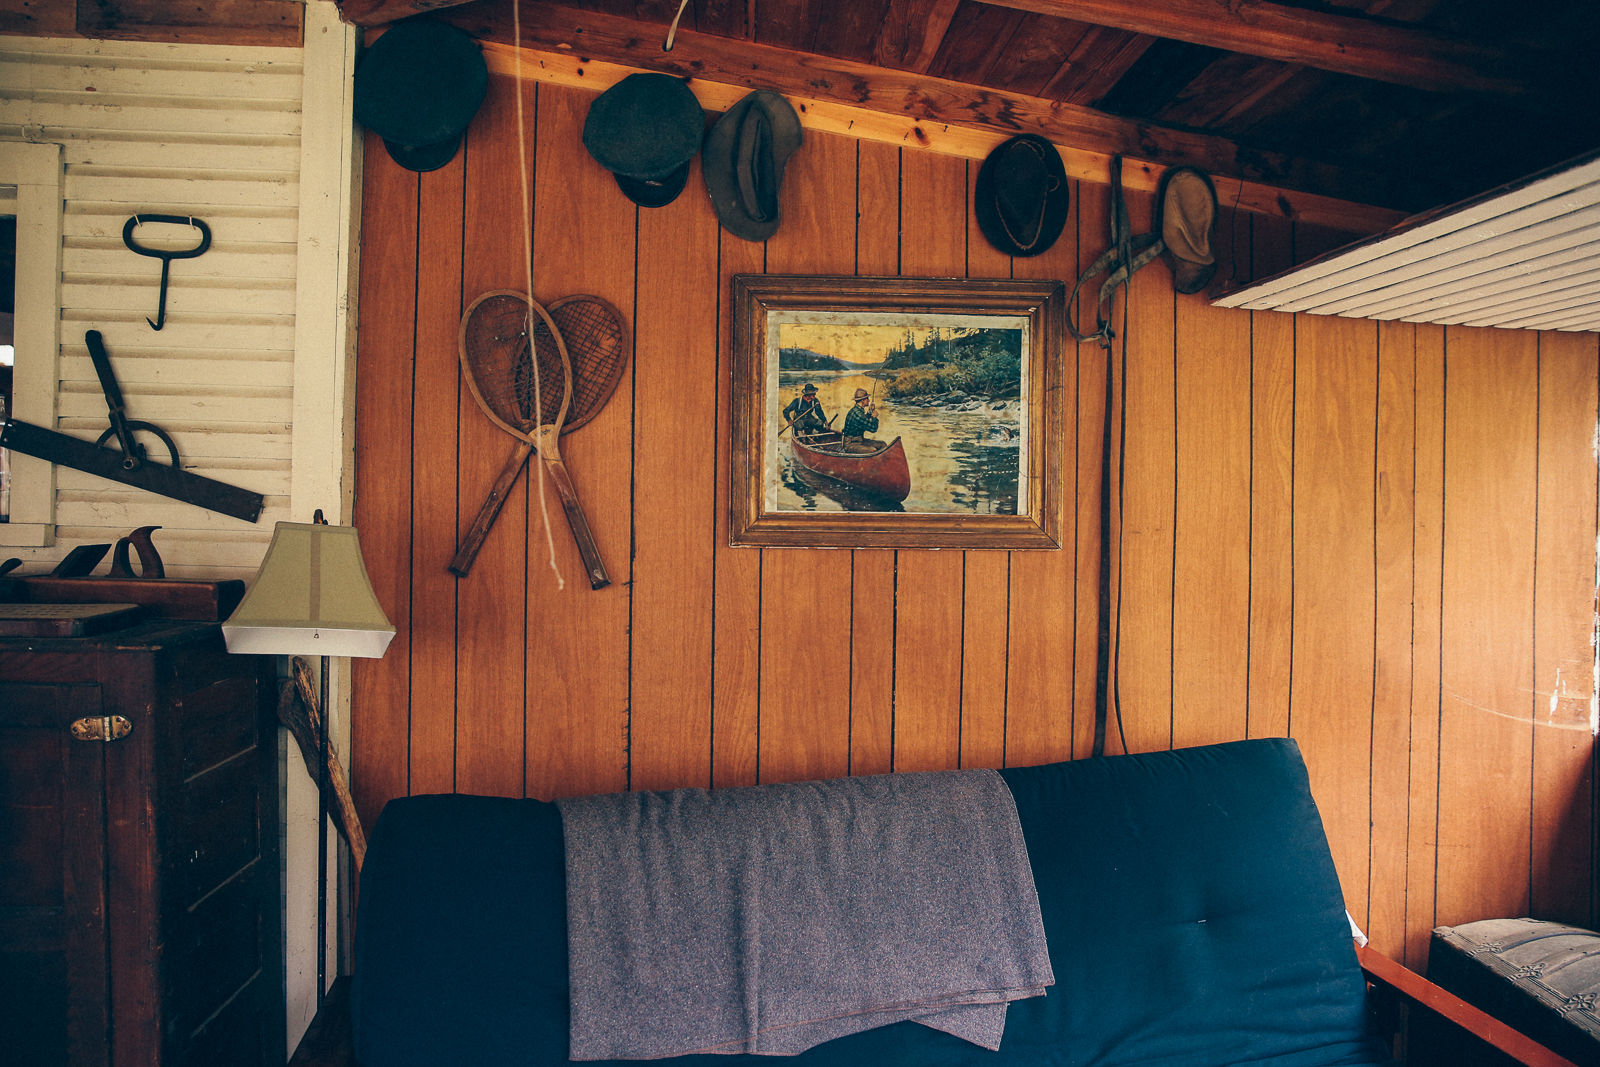 cabins-11.jpg